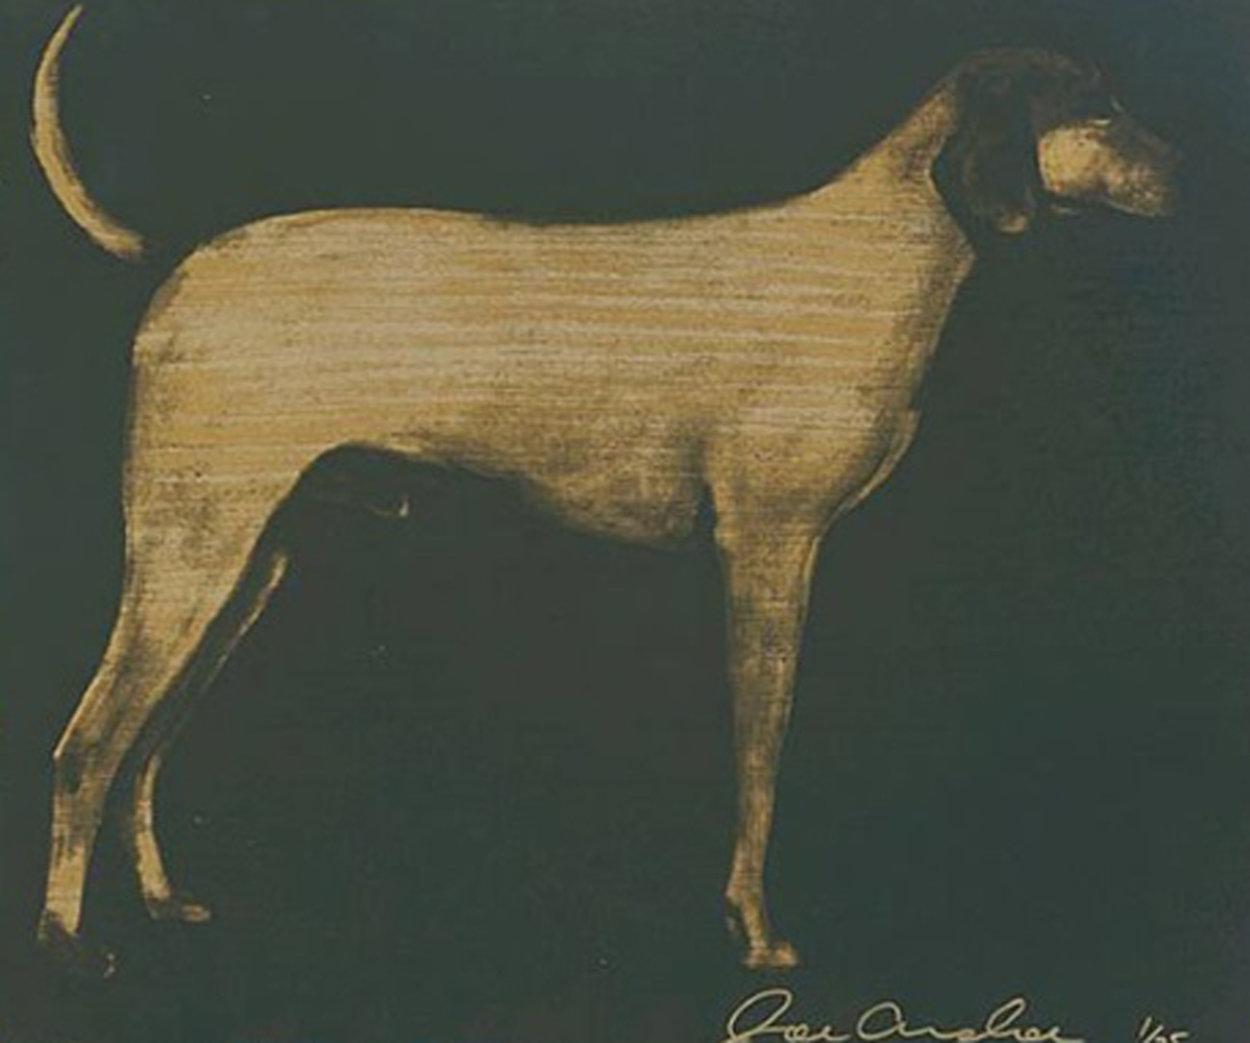 Medium Dog (Olive Green And Byzantine Gold) 1998 Limited Edition Print by Joe Andoe